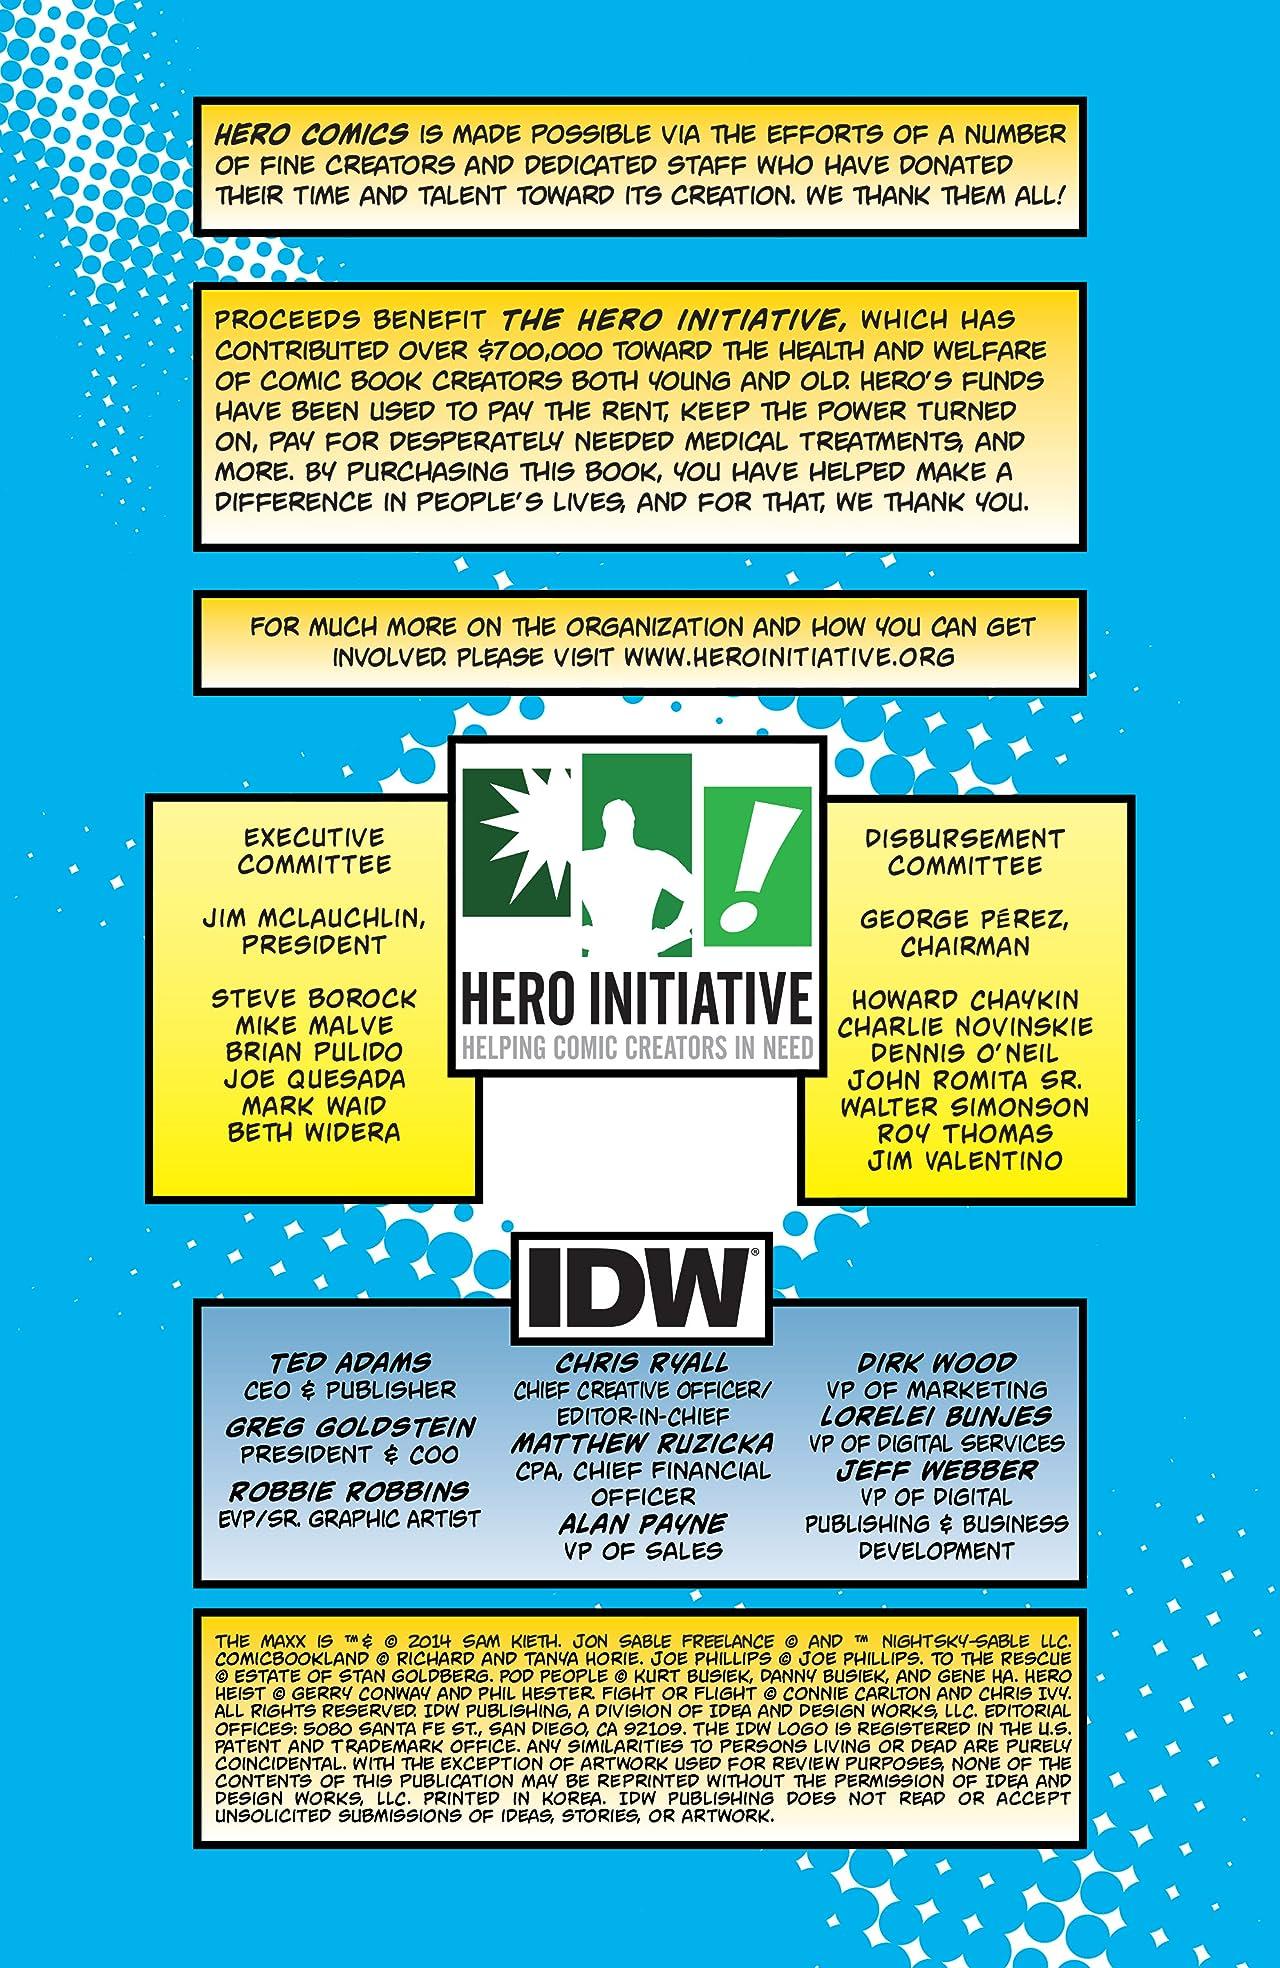 Hero Comics 2014